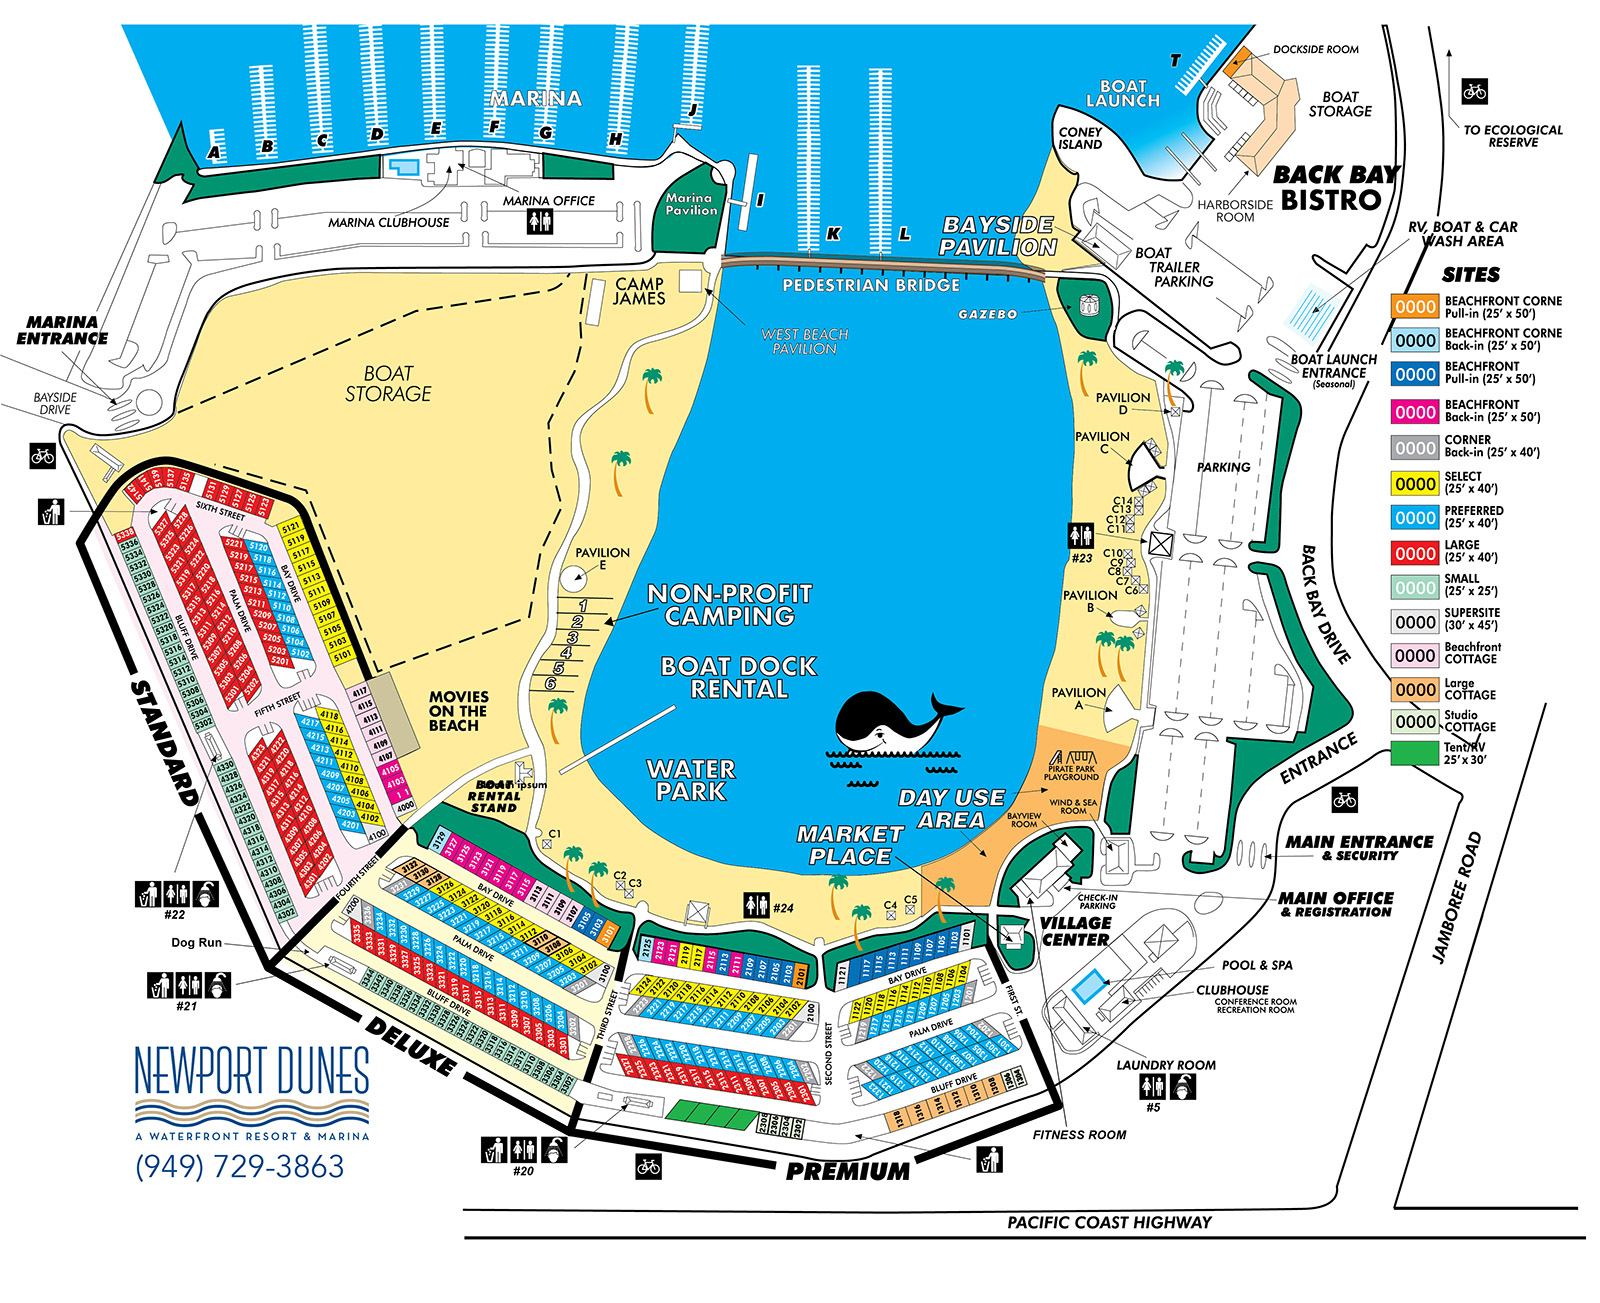 Rv Park In Orange County | Newport Dunes Waterfront Resort - California Rv Resorts Map